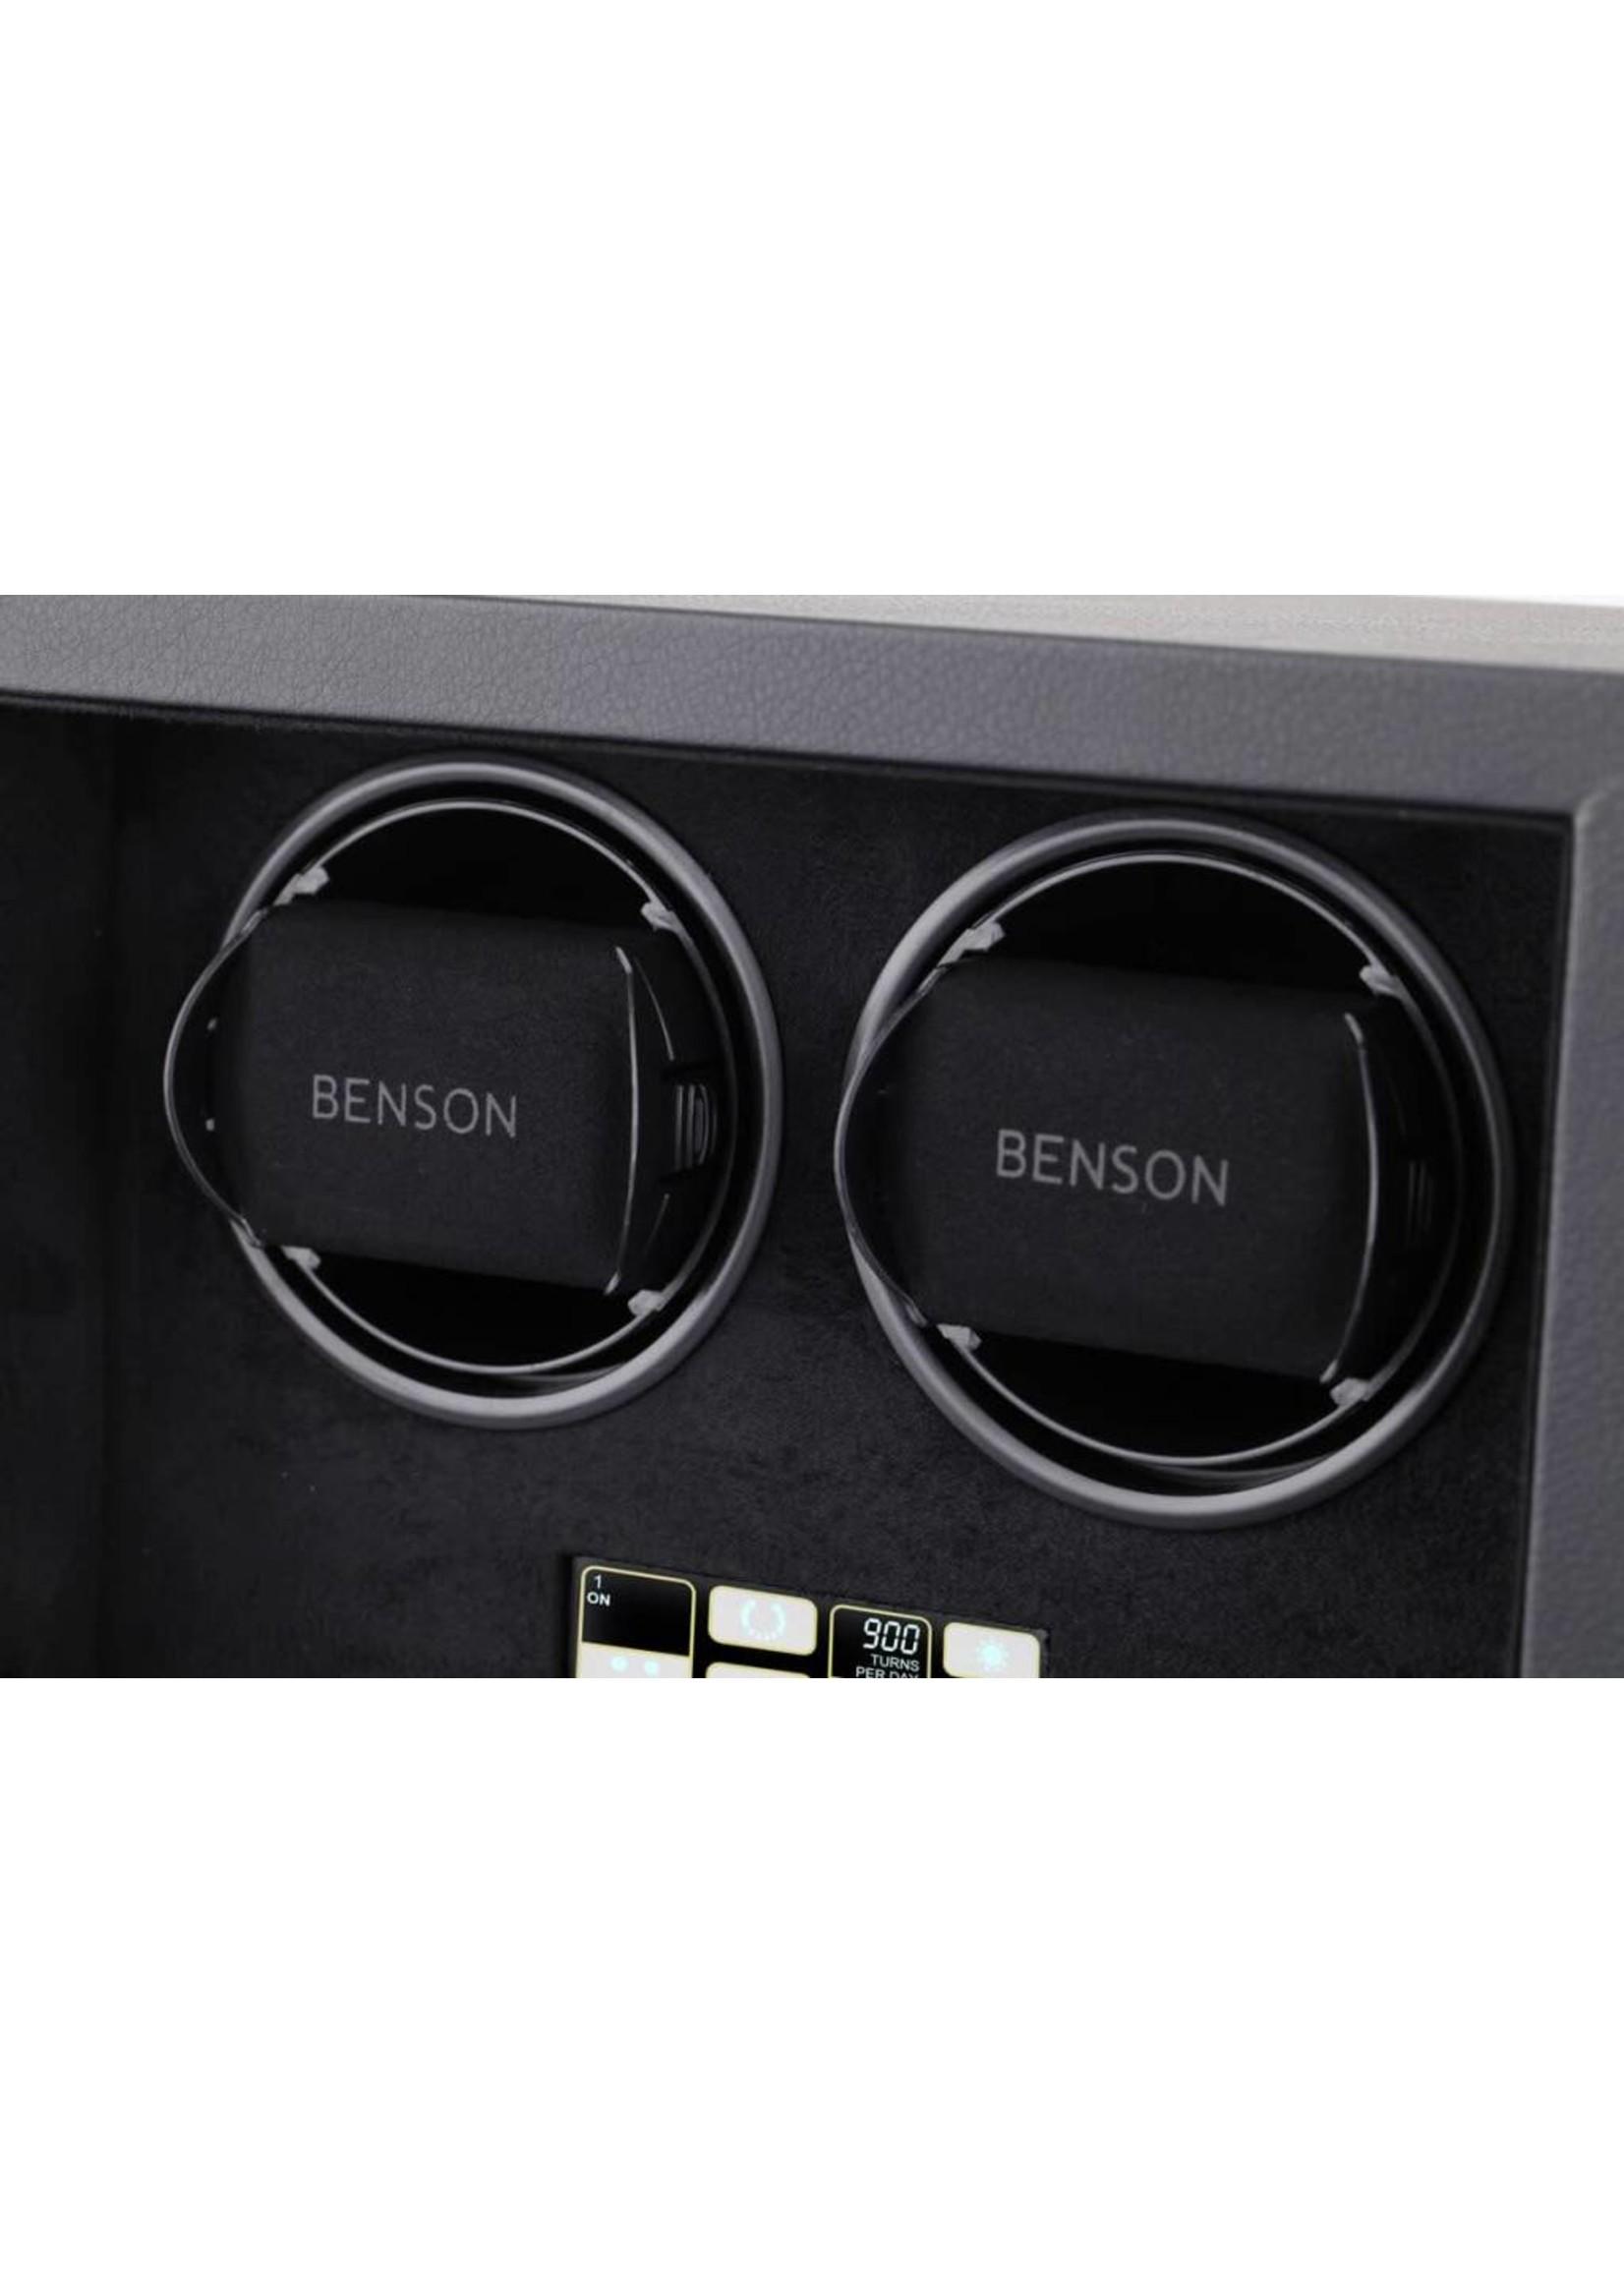 BENSON COMPACT WINDER (2)